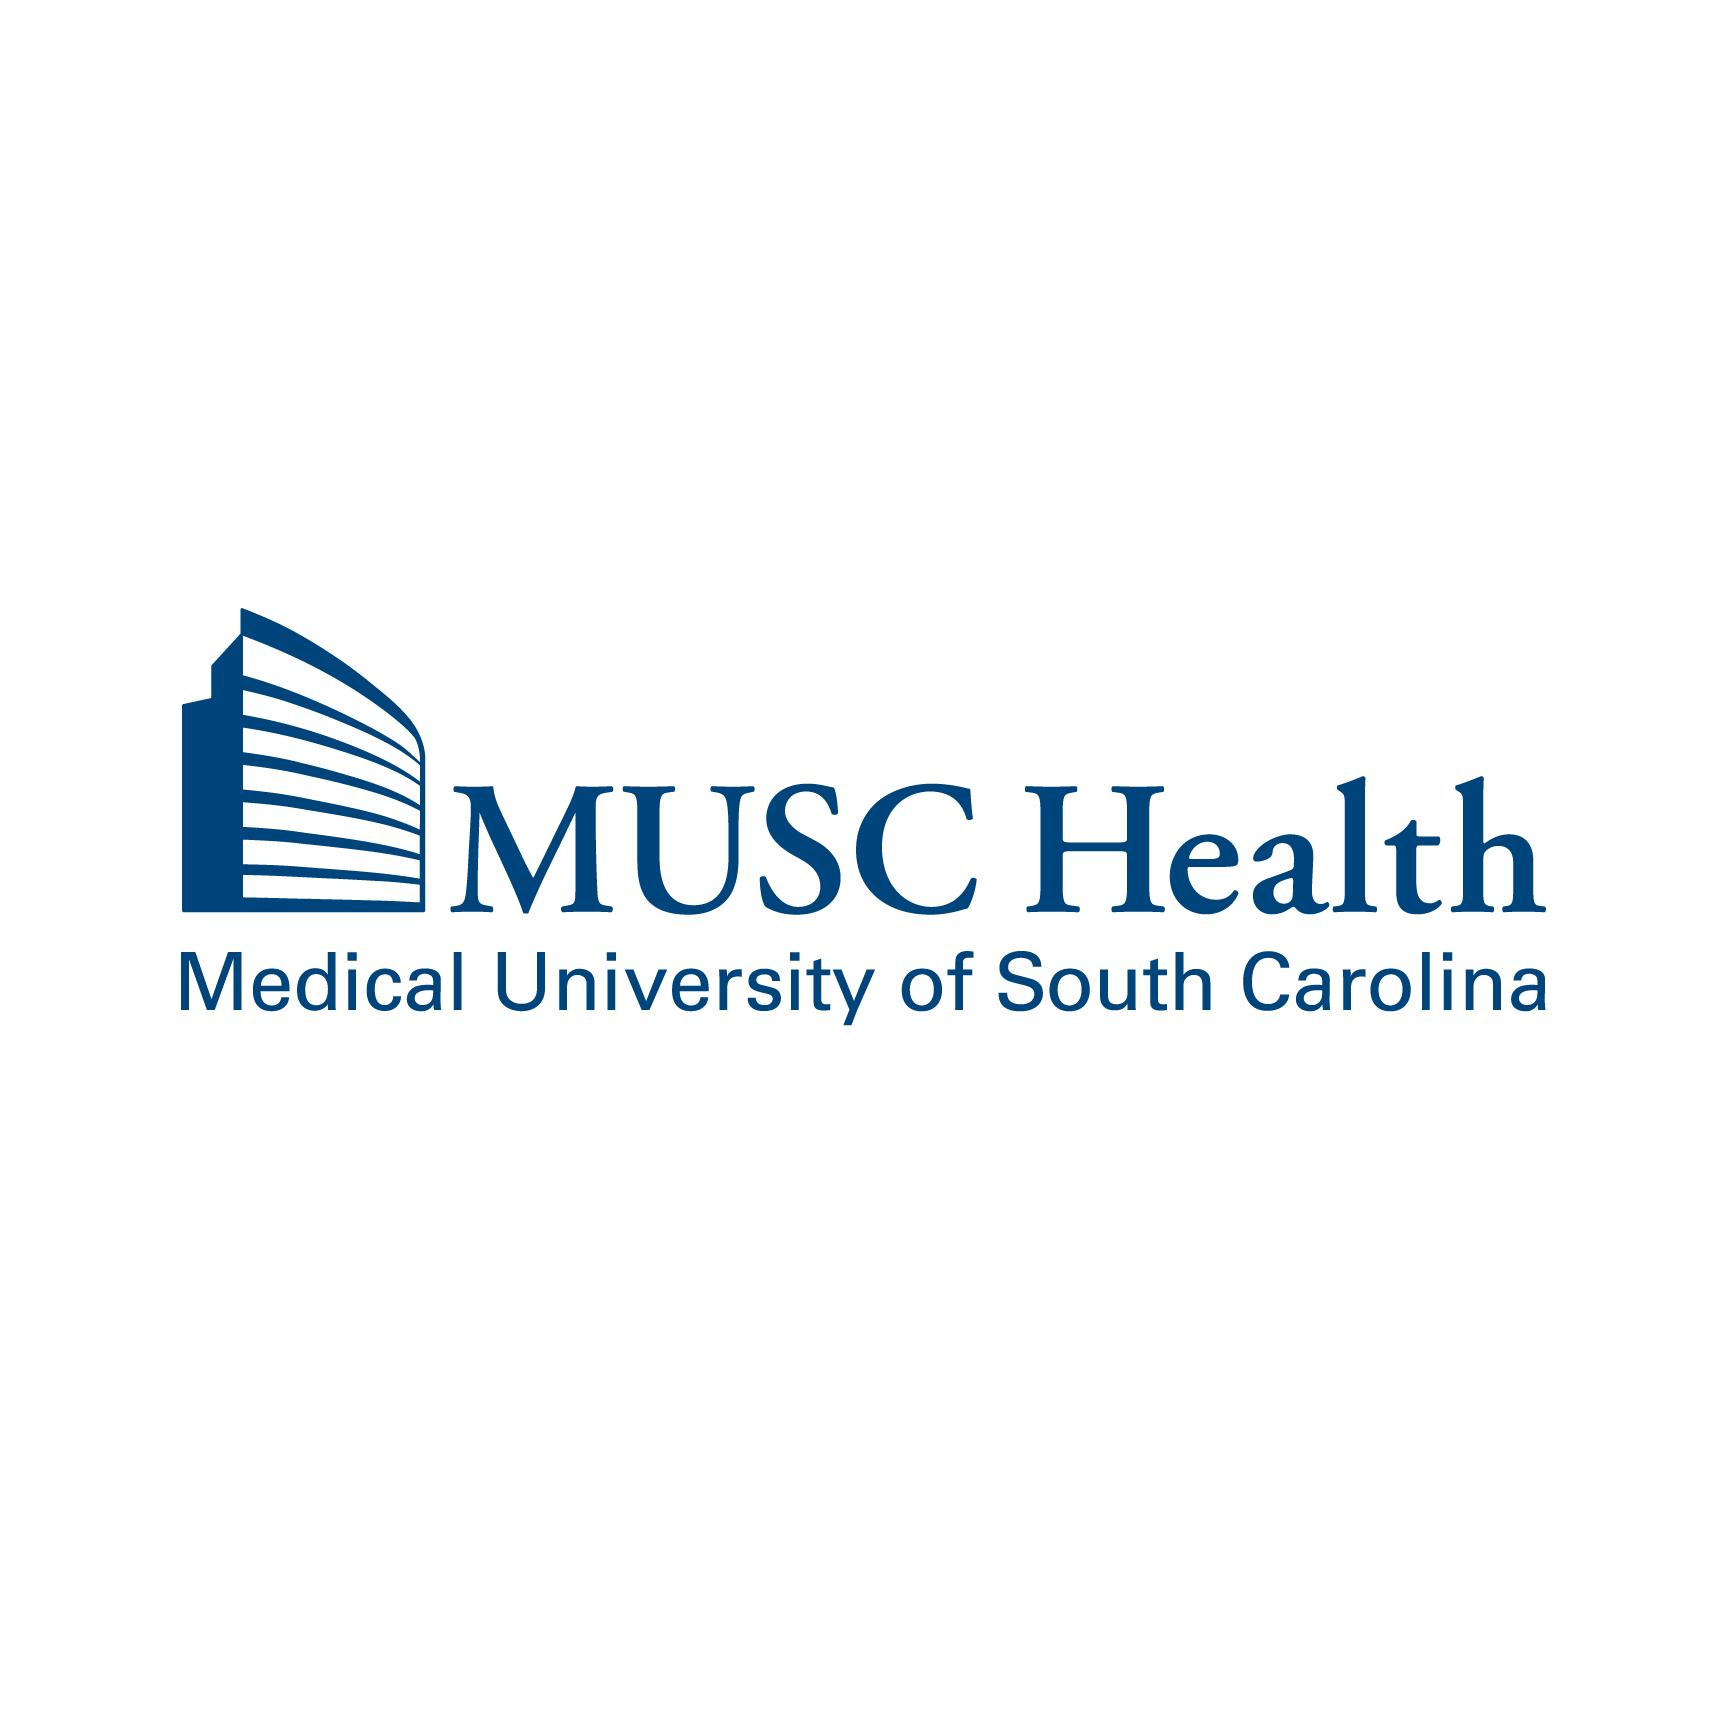 MUSC Health-University Medical Center 171 Ashley Ave